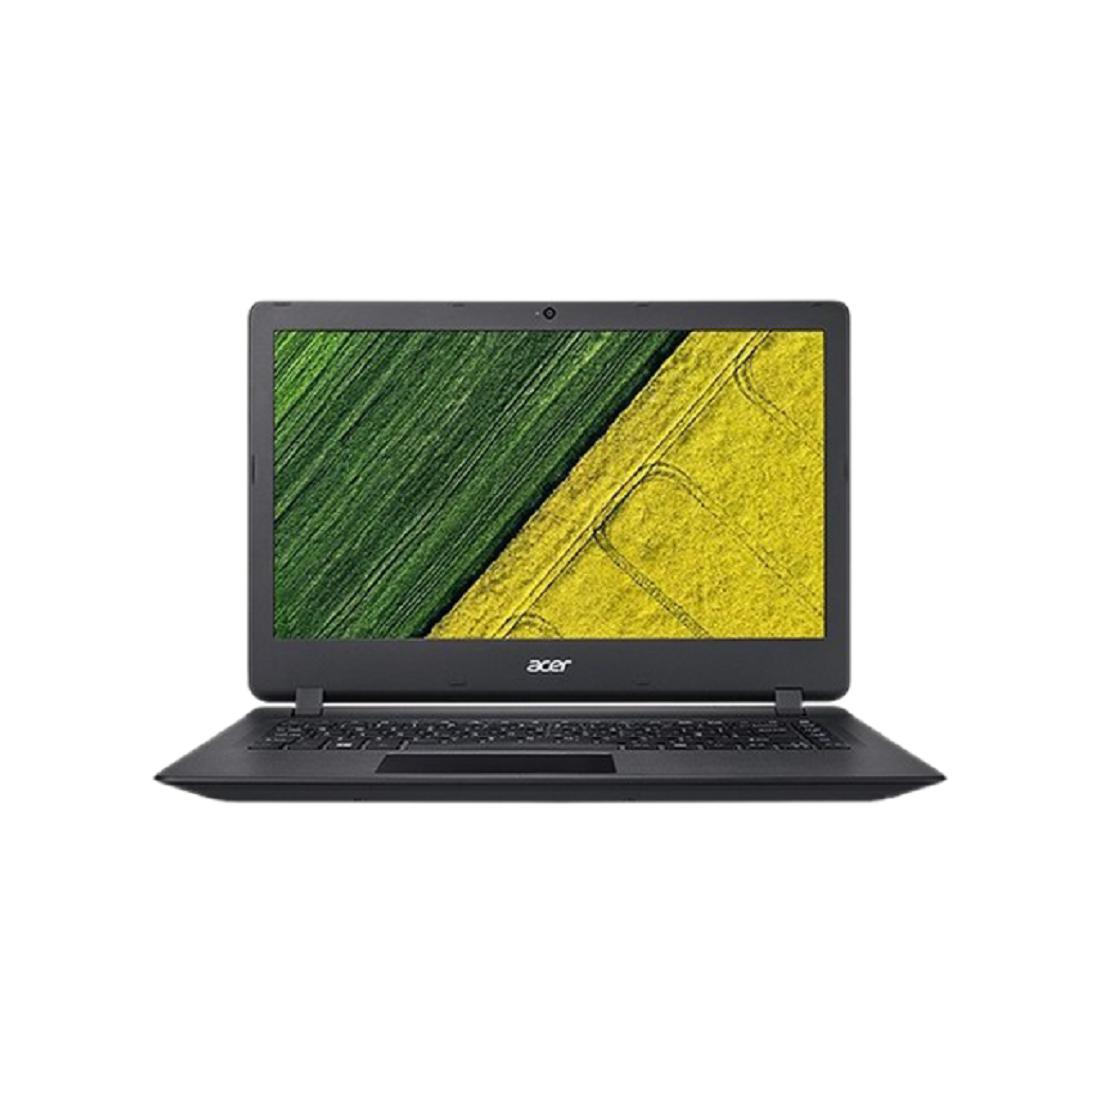 Máy xách tay/ Laptop Acer ES1-432-C3C9 (NX.GFSSV.005) (Đen) –